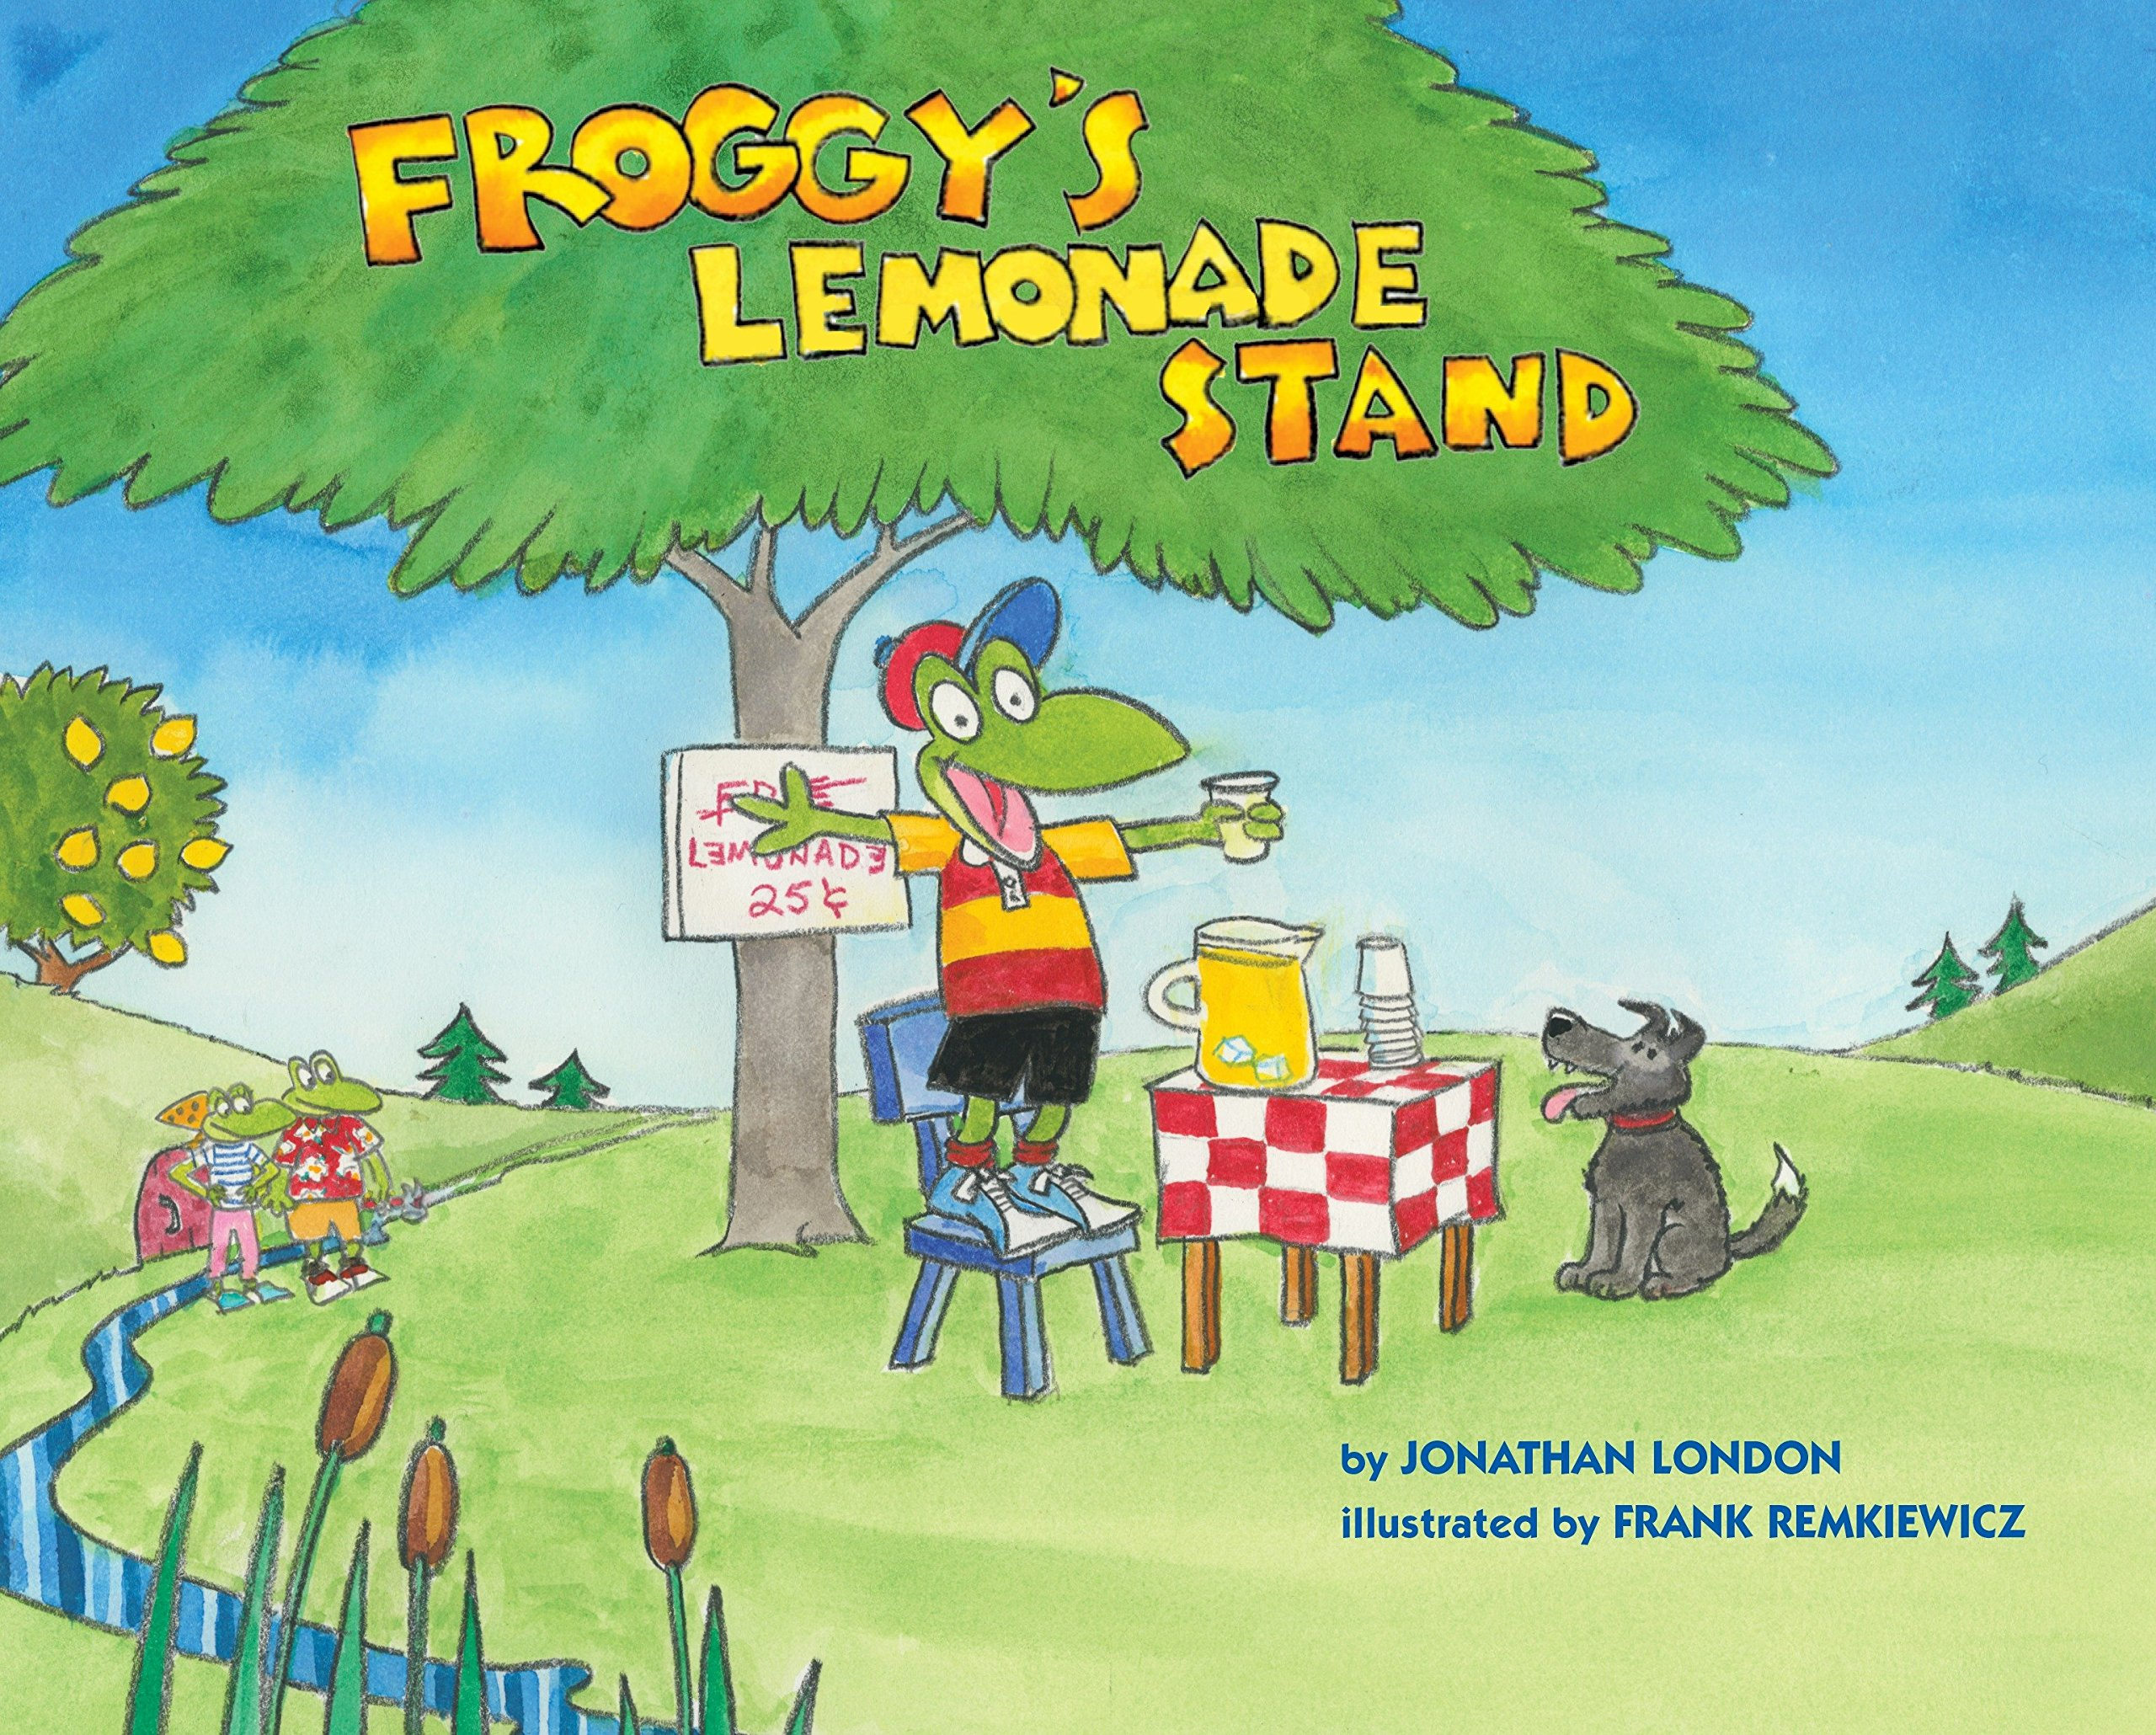 Froggy's Lemonade Stand